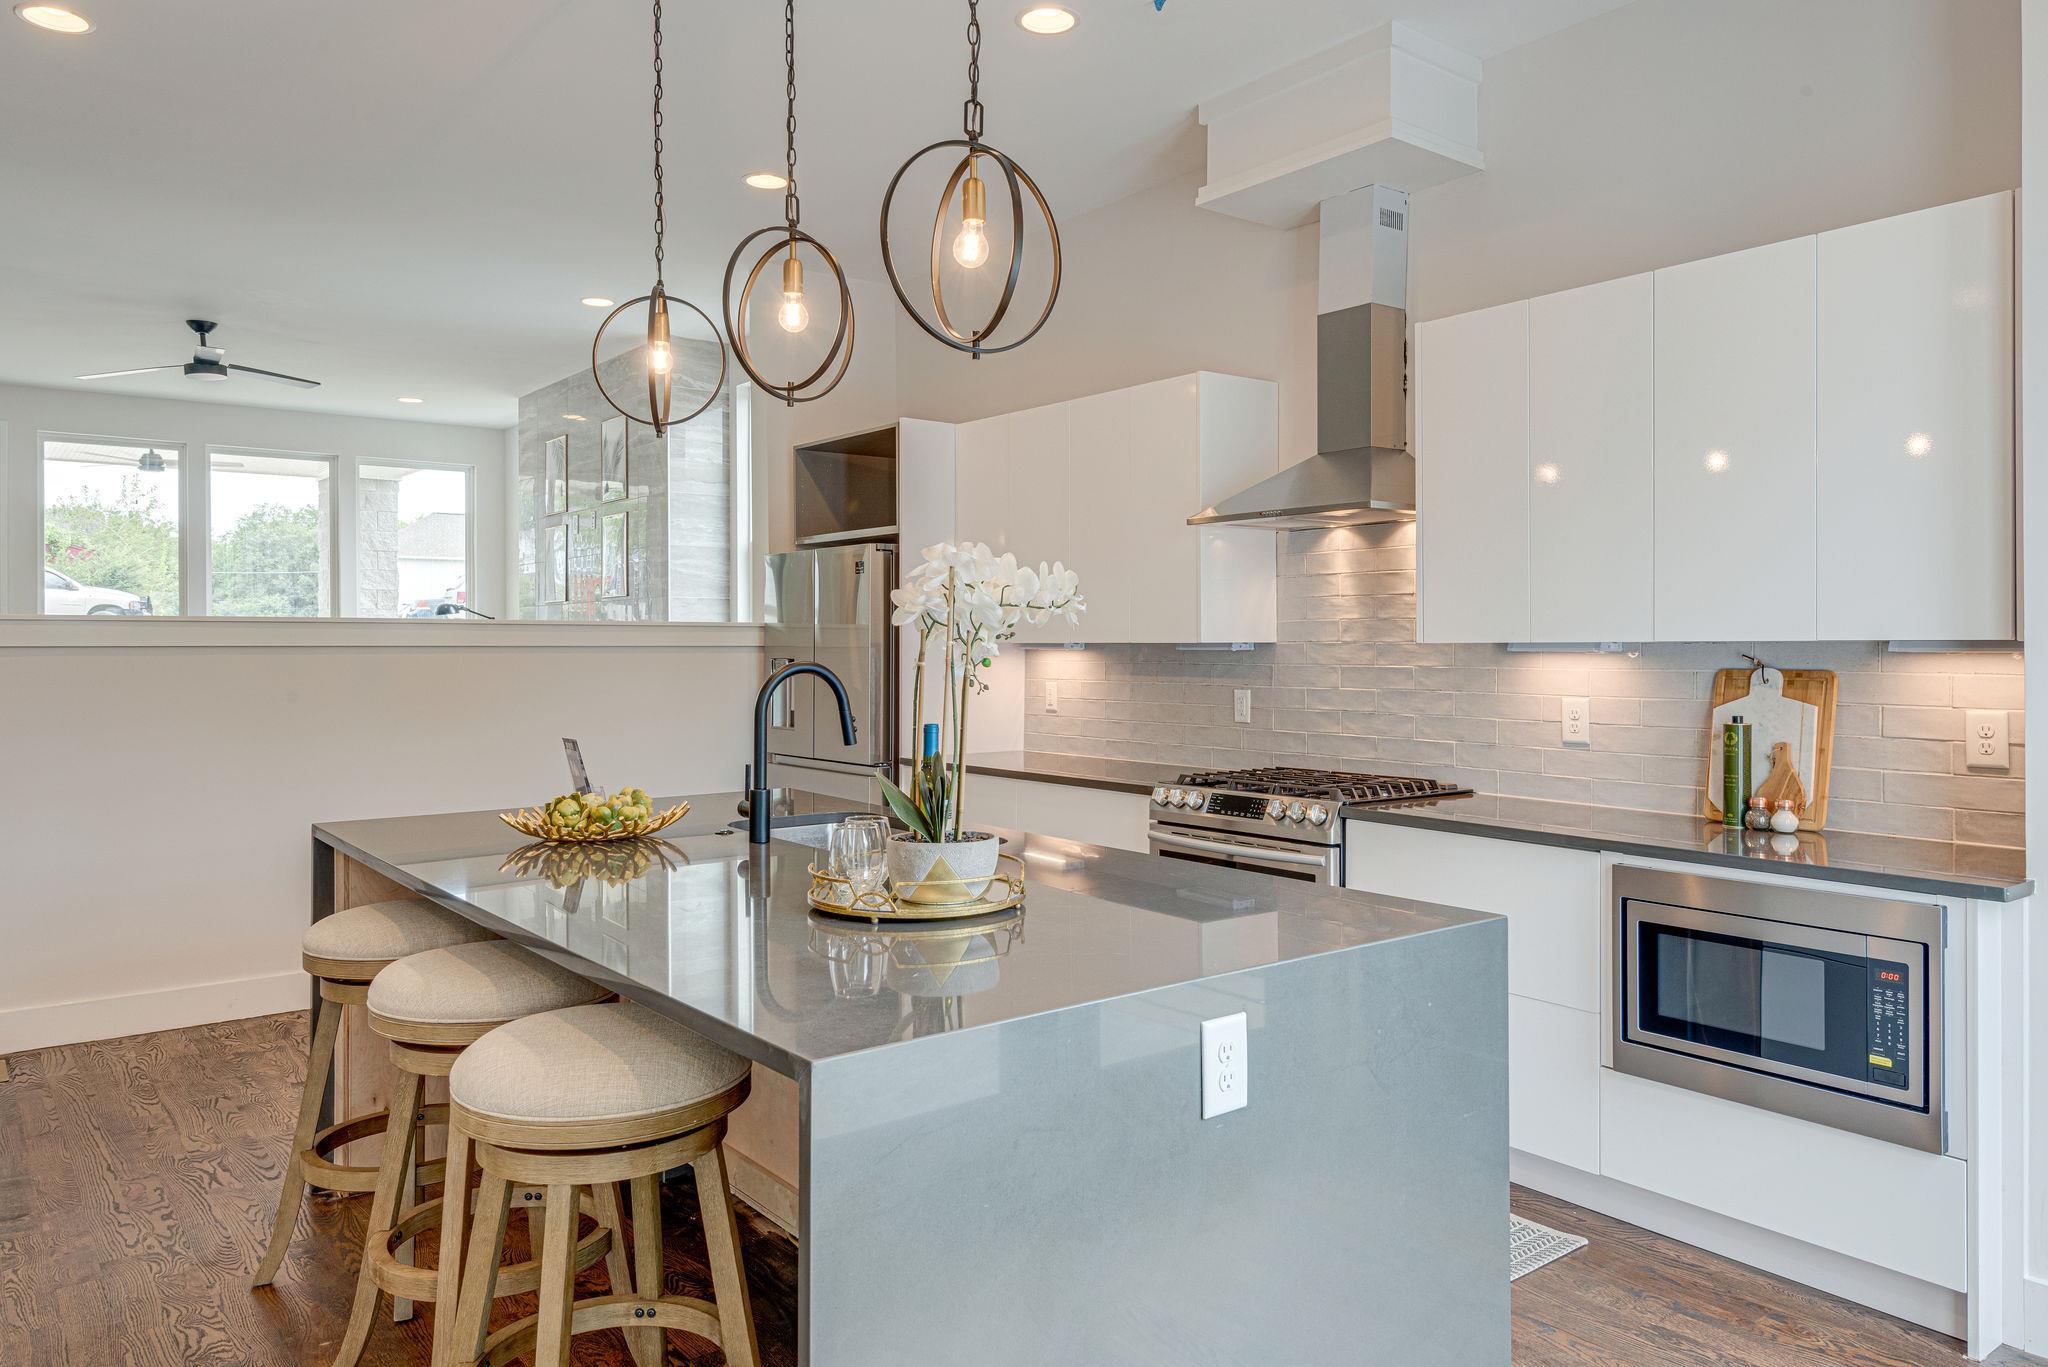 1104B Cecilia Ave, Nashville, TN 37208 - Nashville, TN real estate listing